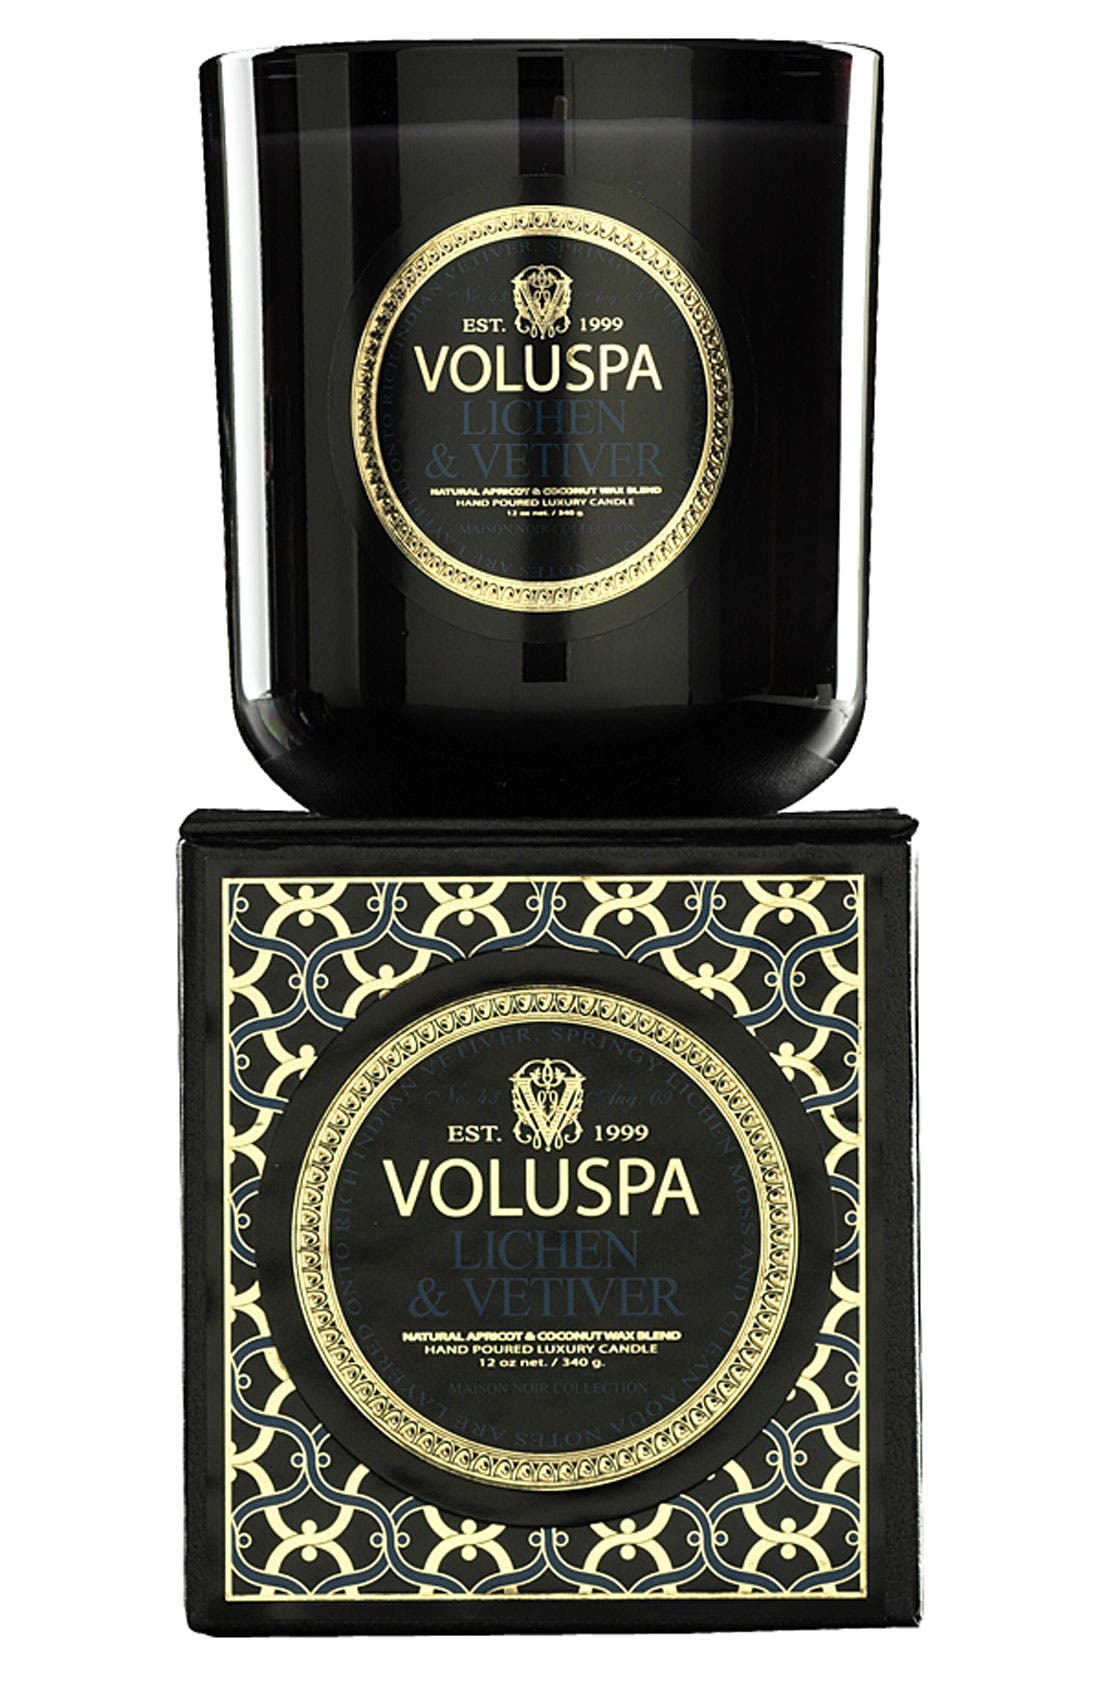 Alternate Image 1 Selected - Voluspa 'Maison Noir - Lichen & Vetiver' Scented Candle